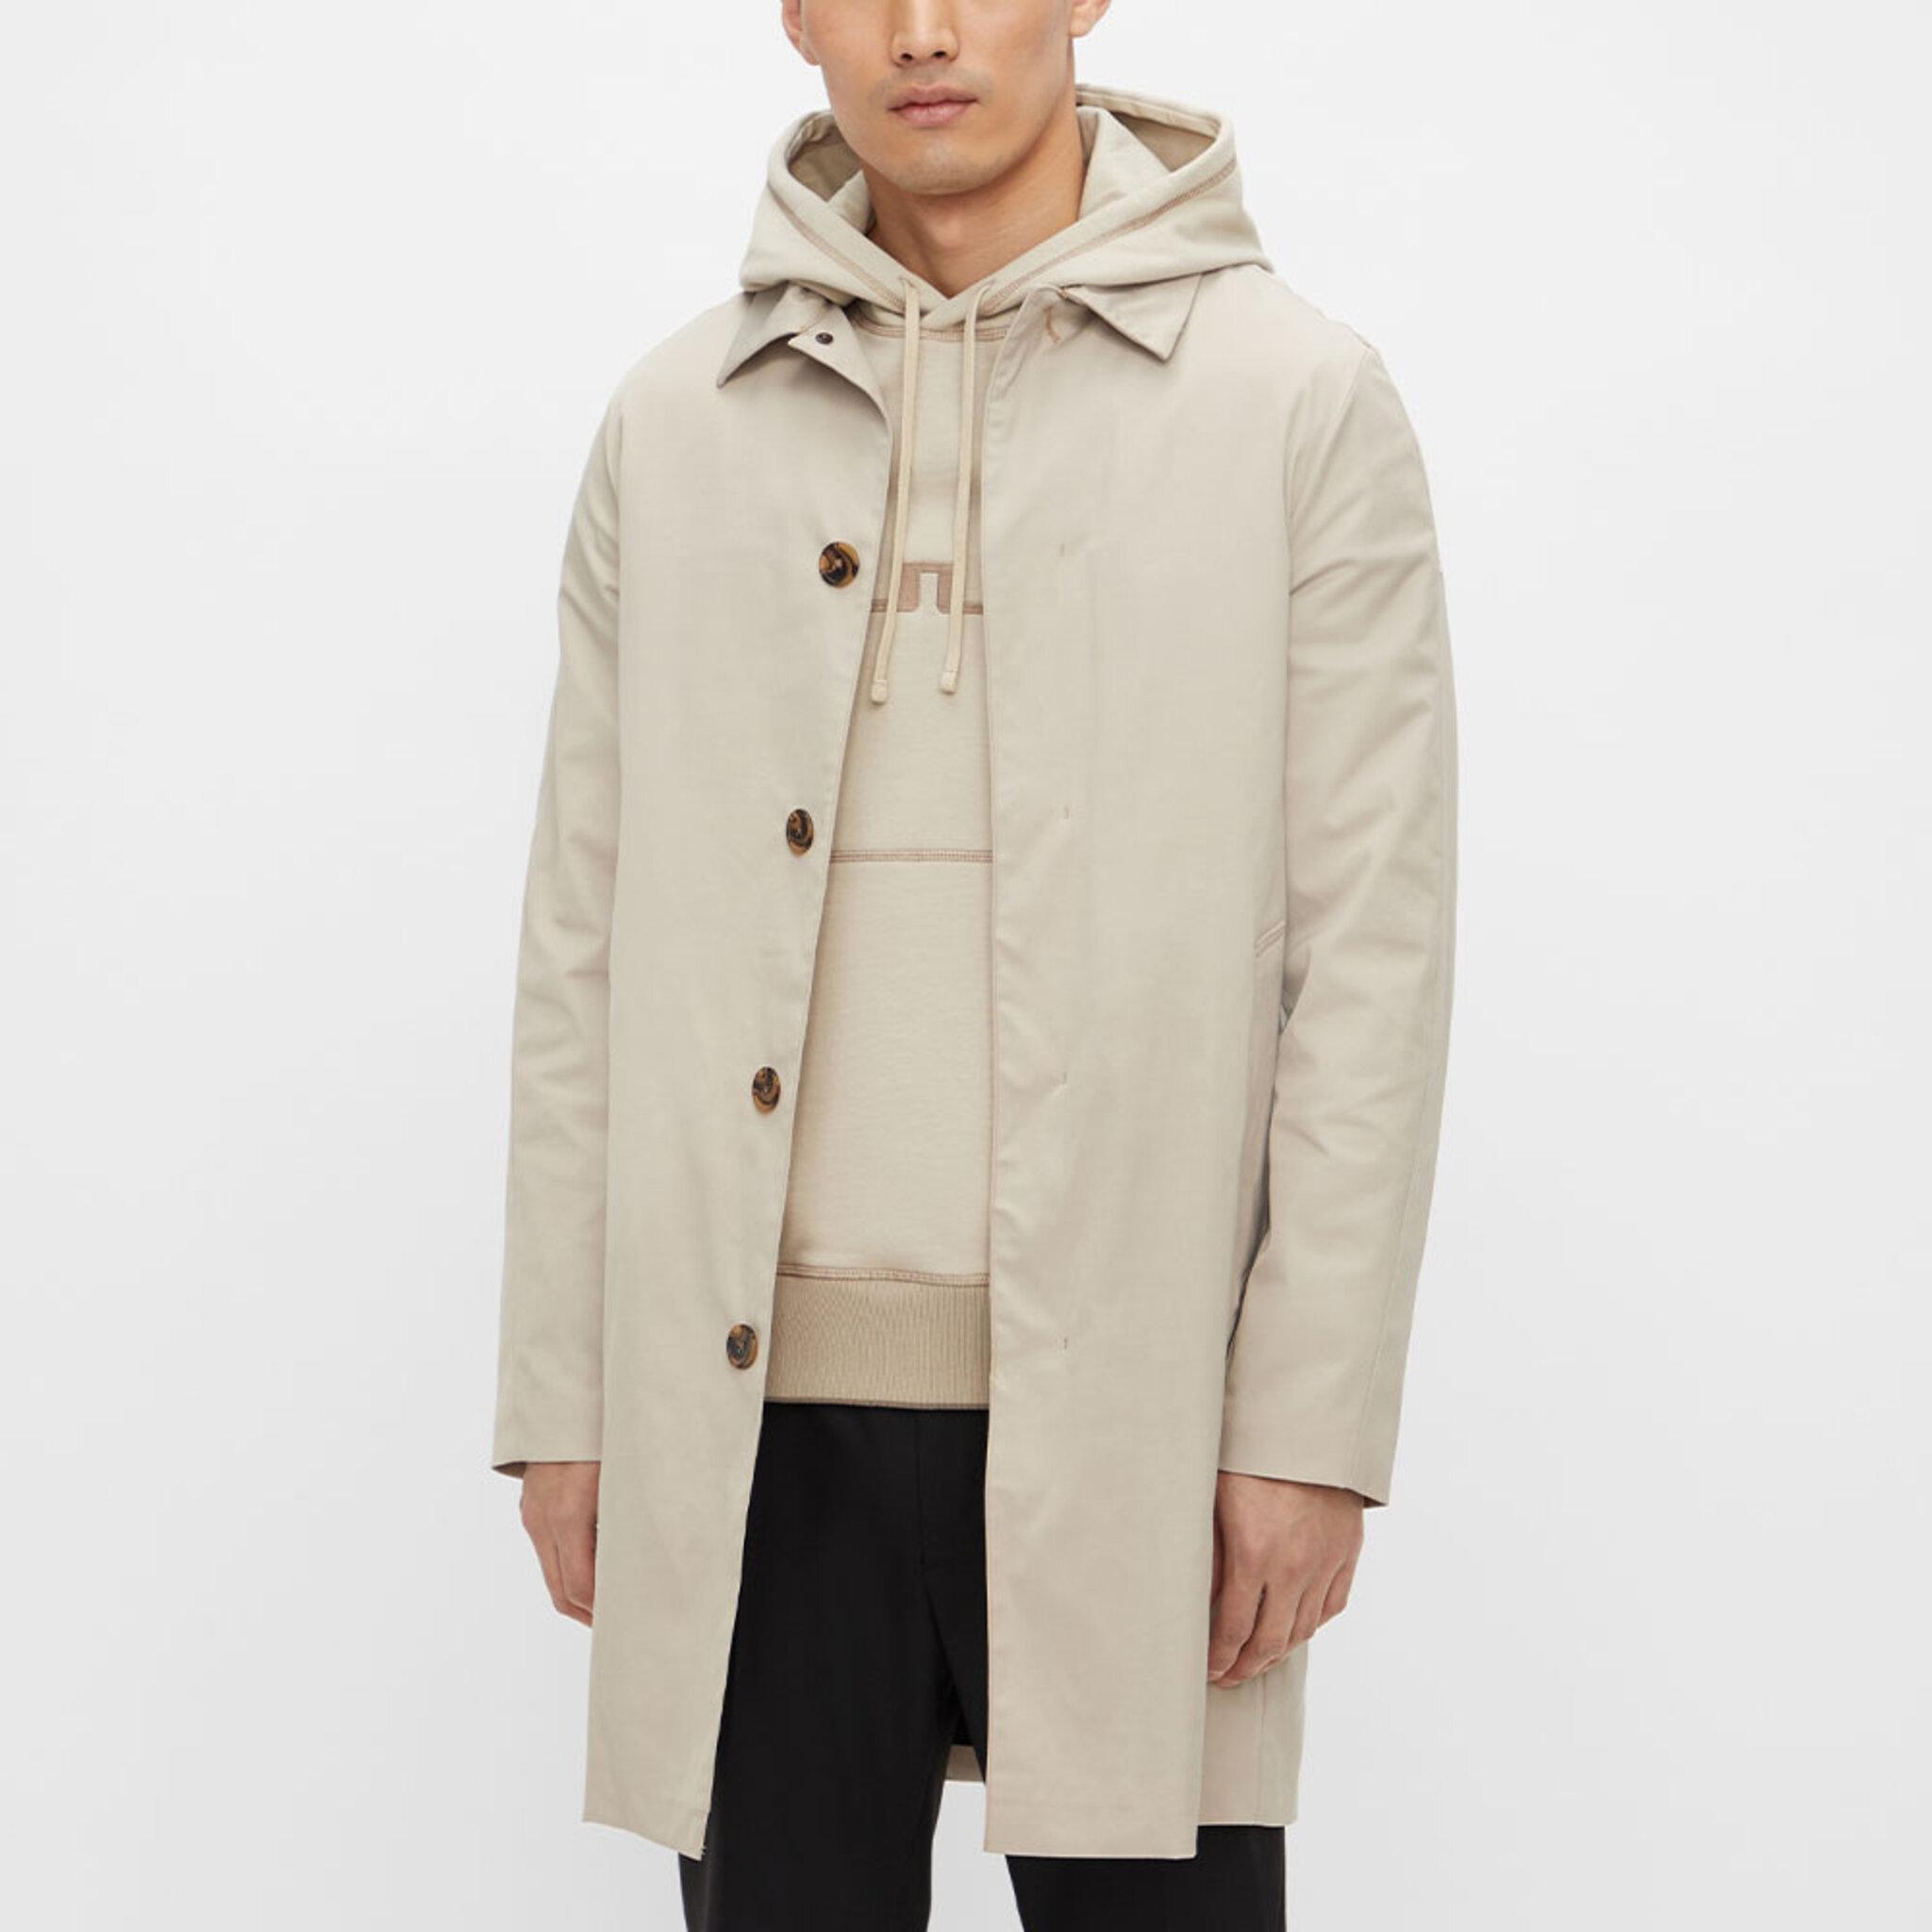 Cane Micro Twill Coat